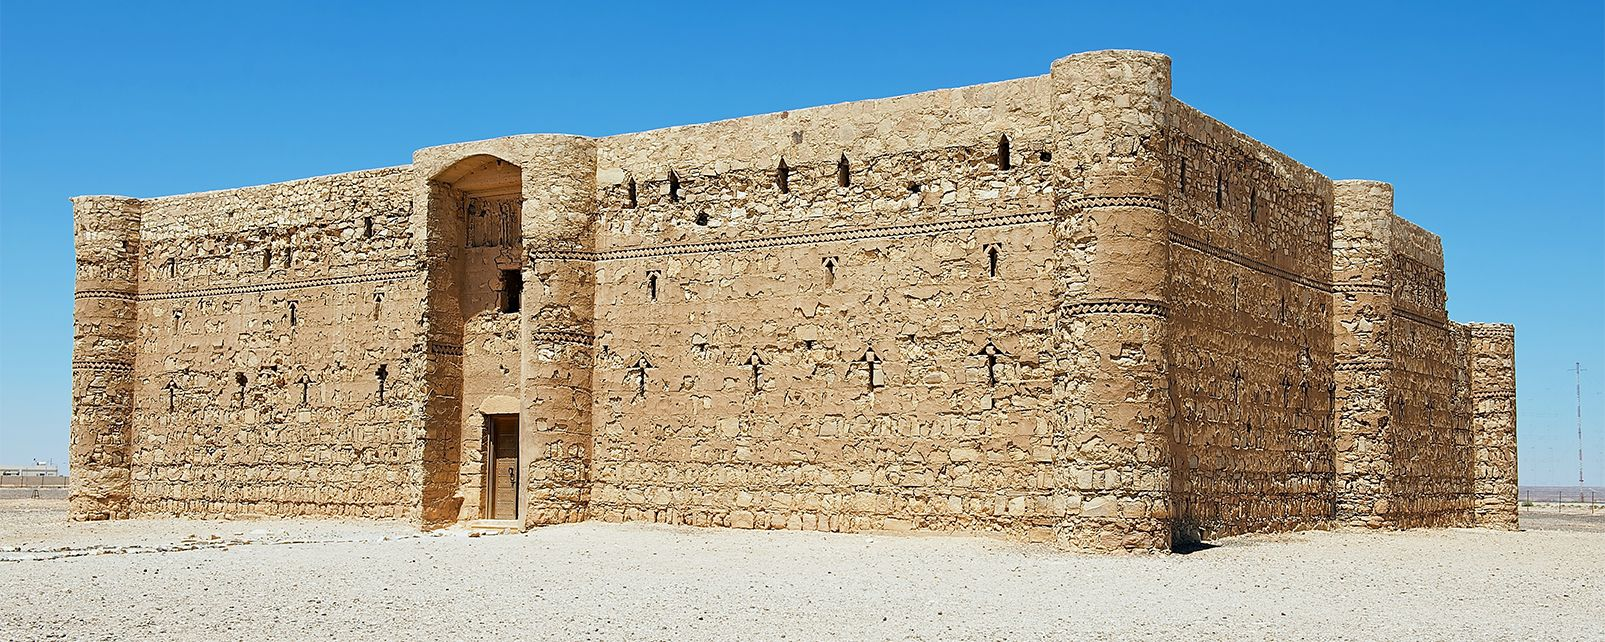 El castillo de Qusayr'el Kharaneh, Qusayr'el Jaraneh, Arte y cultura, Jordania